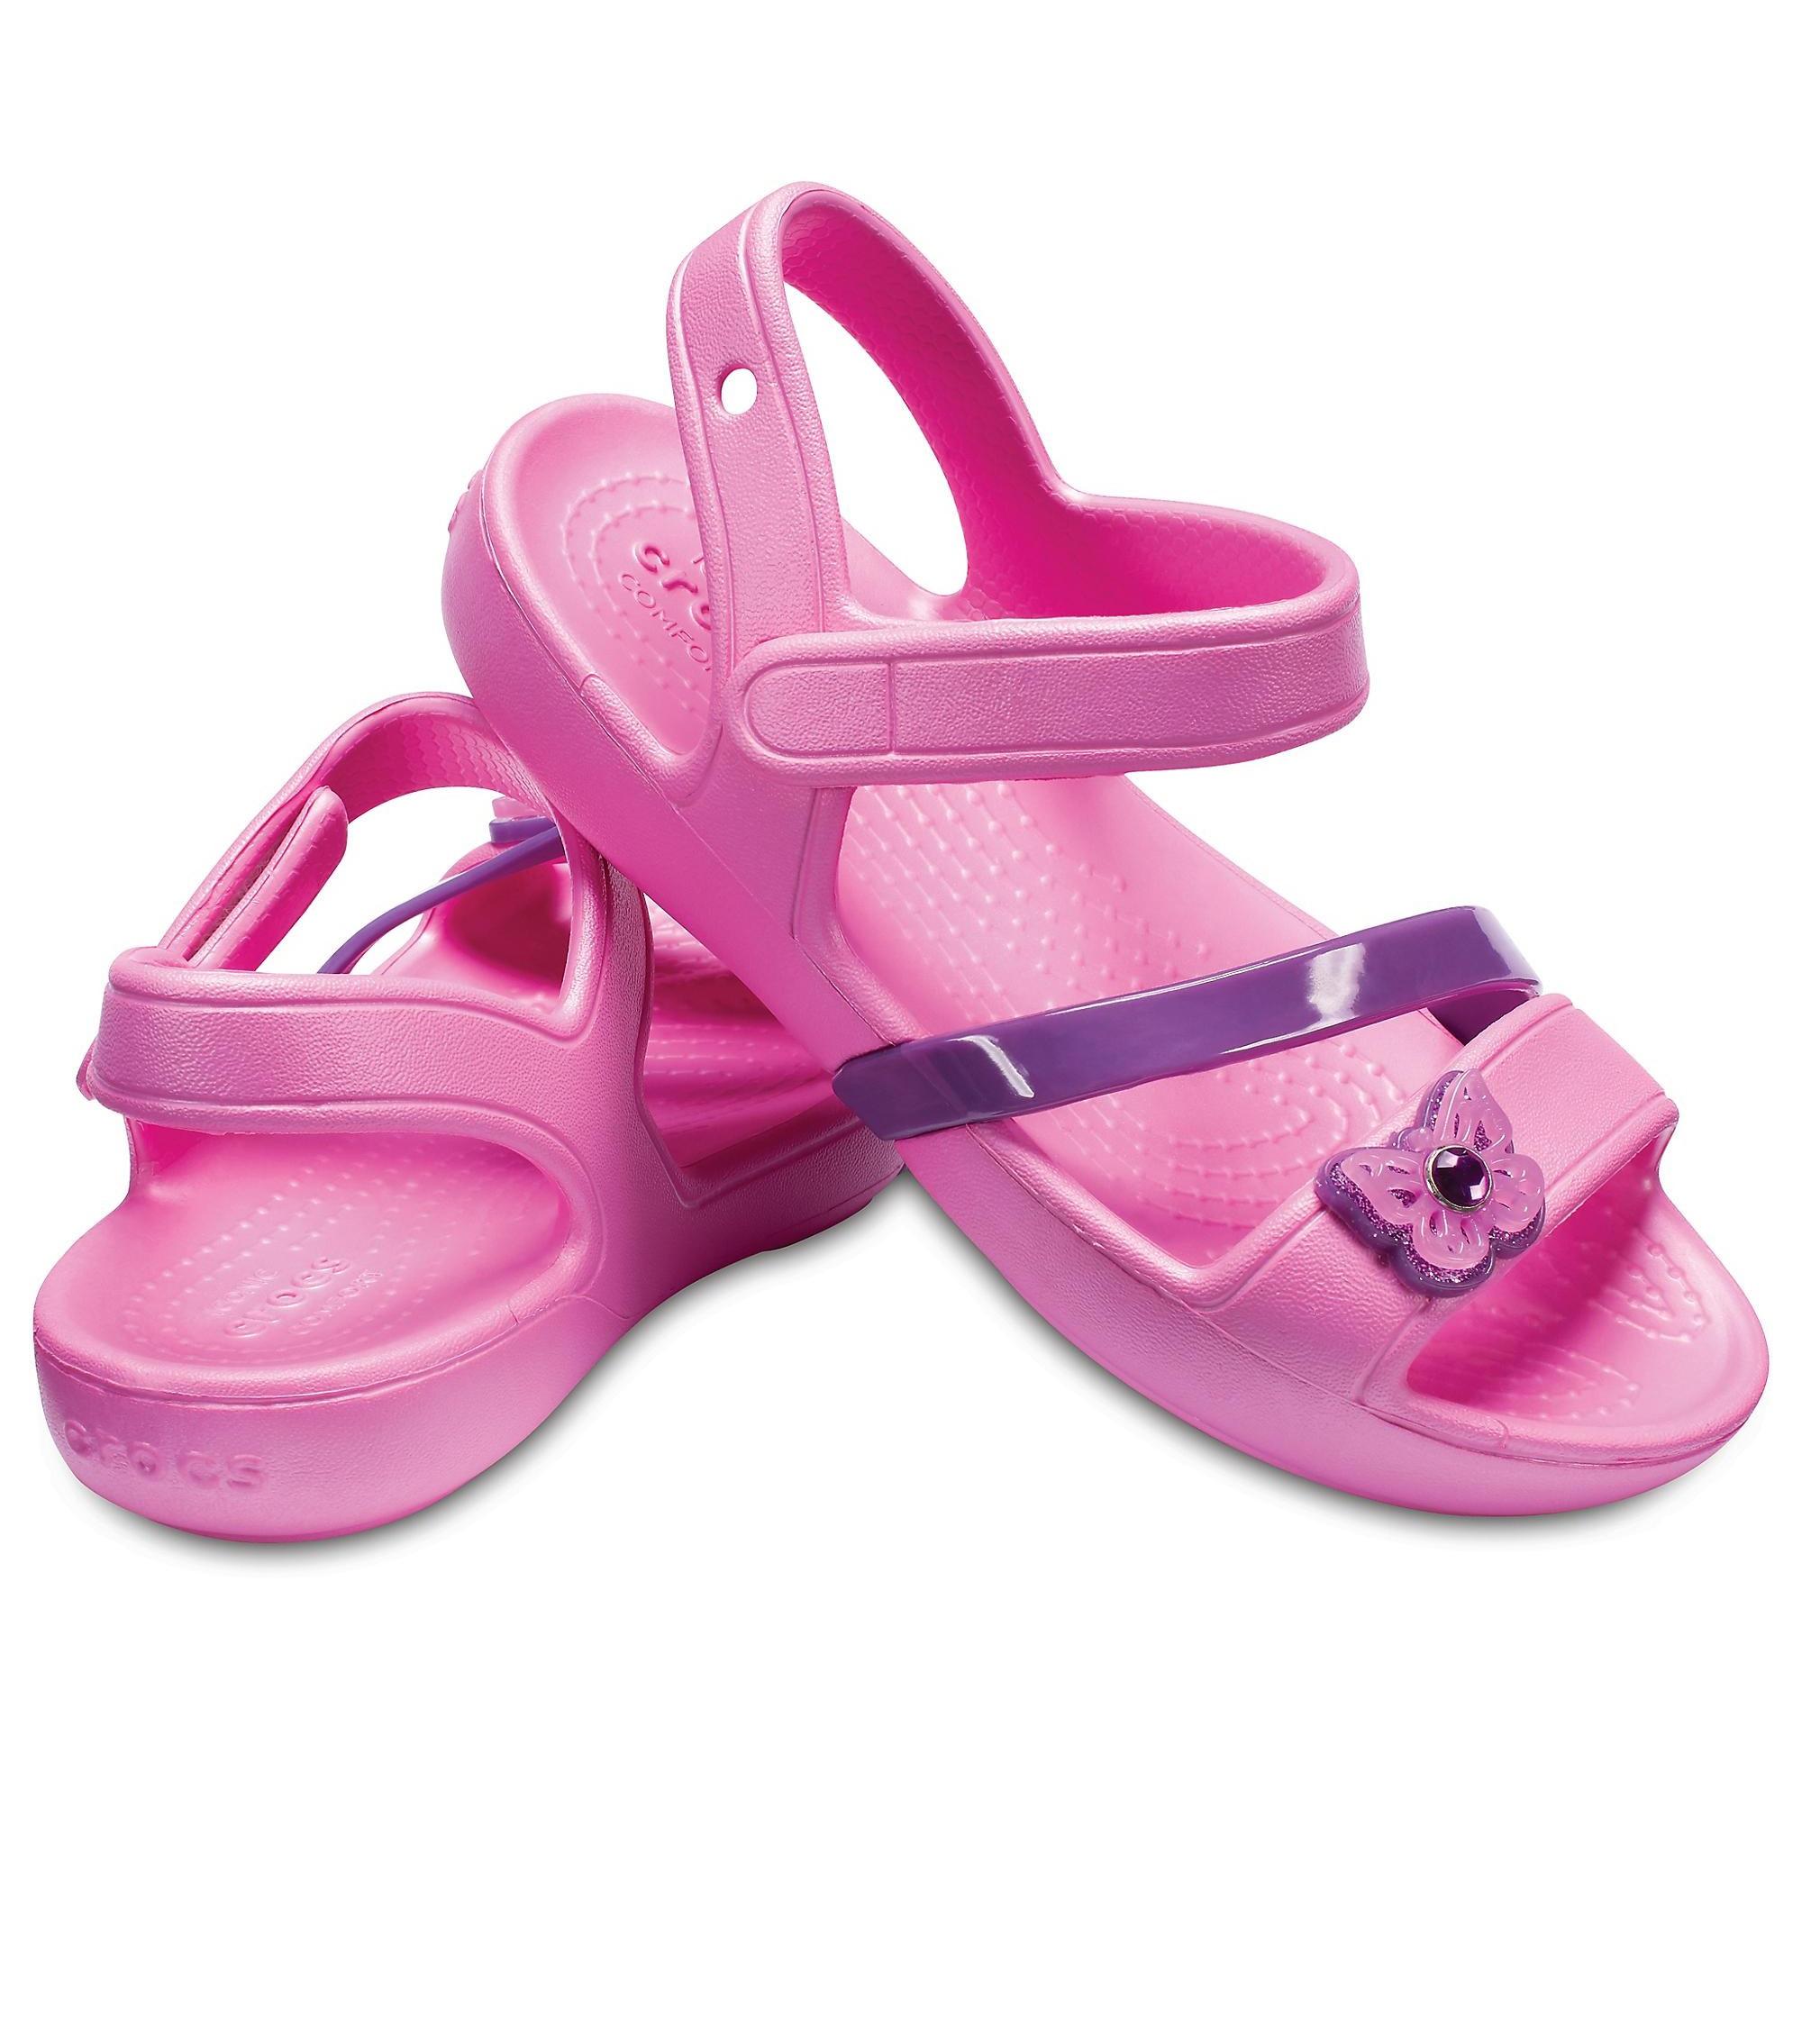 Купити Сандалі Crocs Lina Sandal party pink - фото 1